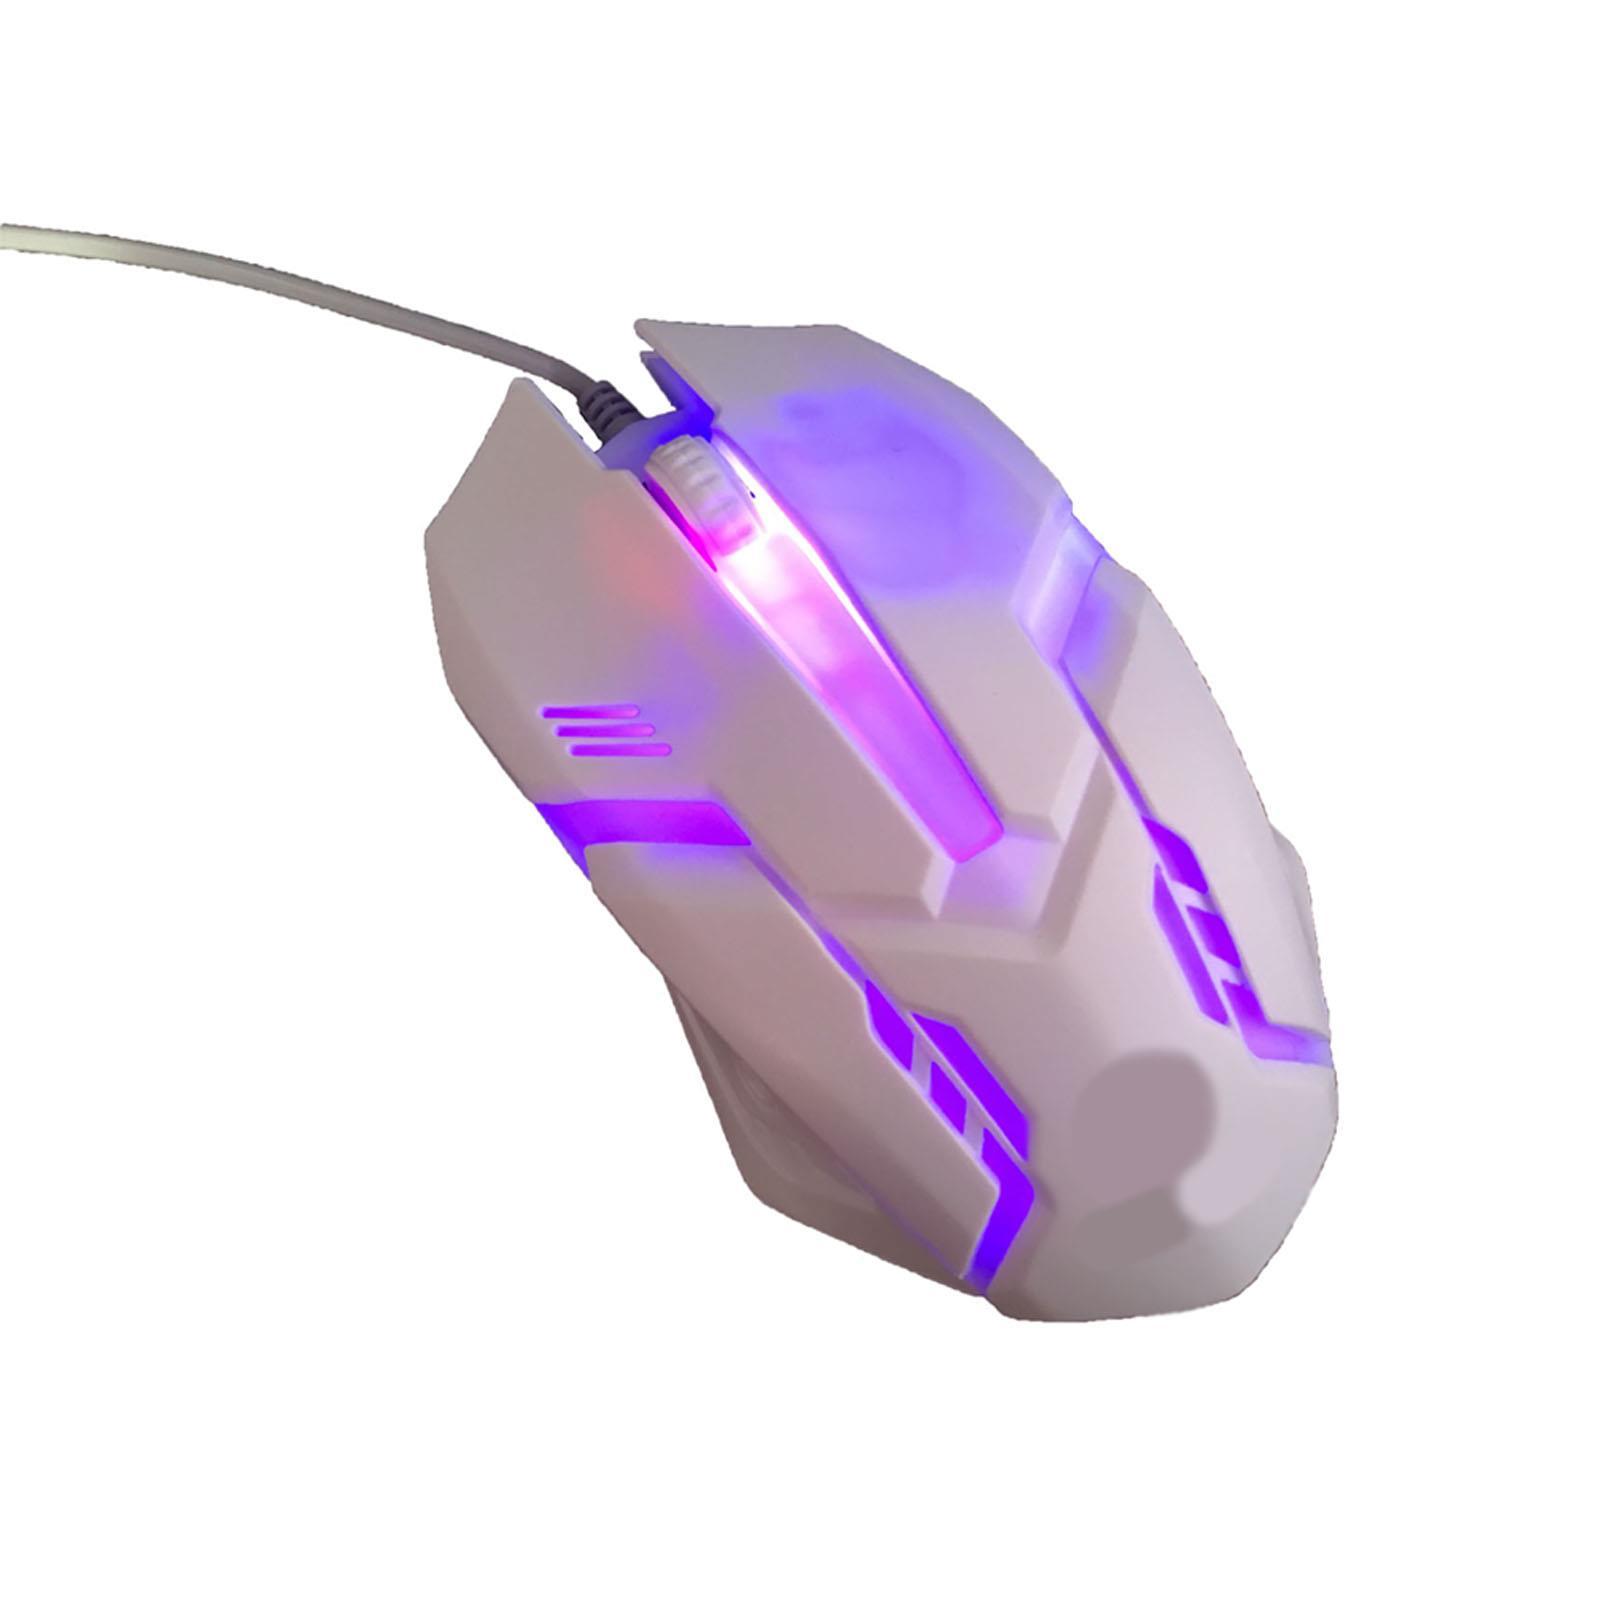 Gaming-Keyboard-Mouse-Backlit-Rainbow-LED-USB-Set-for-PC-Laptop-PS4-Xbox-One thumbnail 30